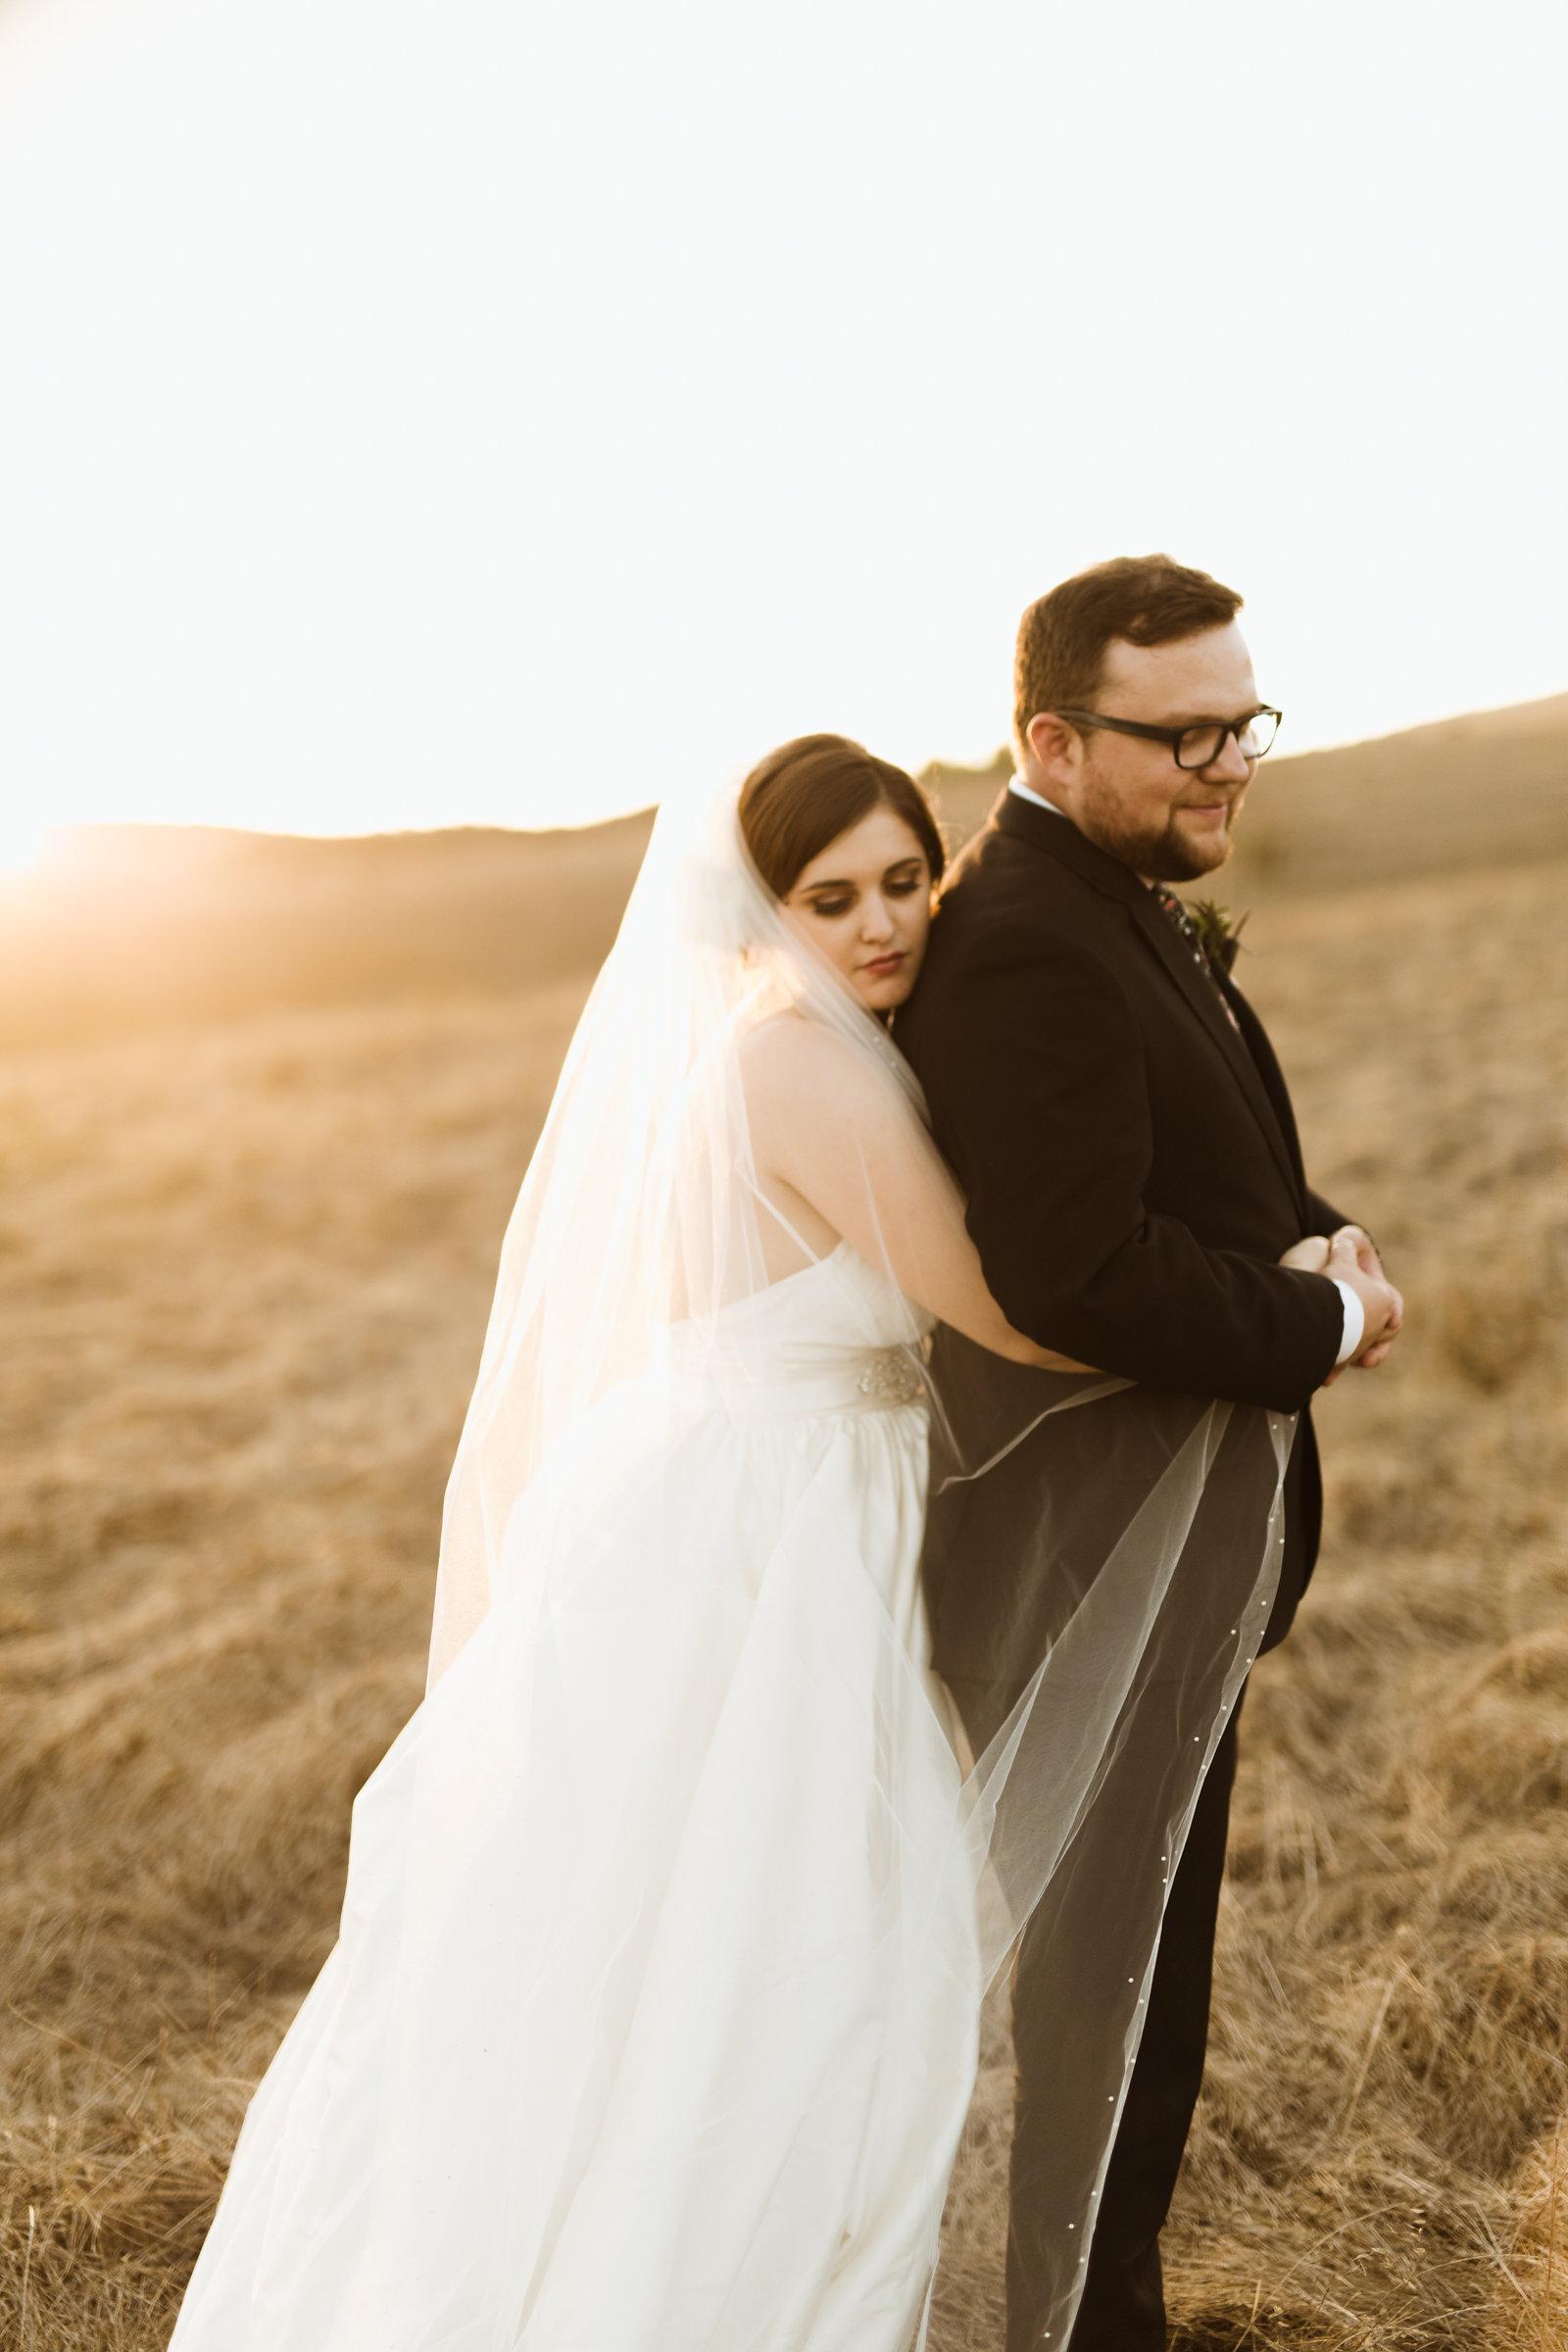 Such an amazing wedding. Congratulations Lauren & Mitch!